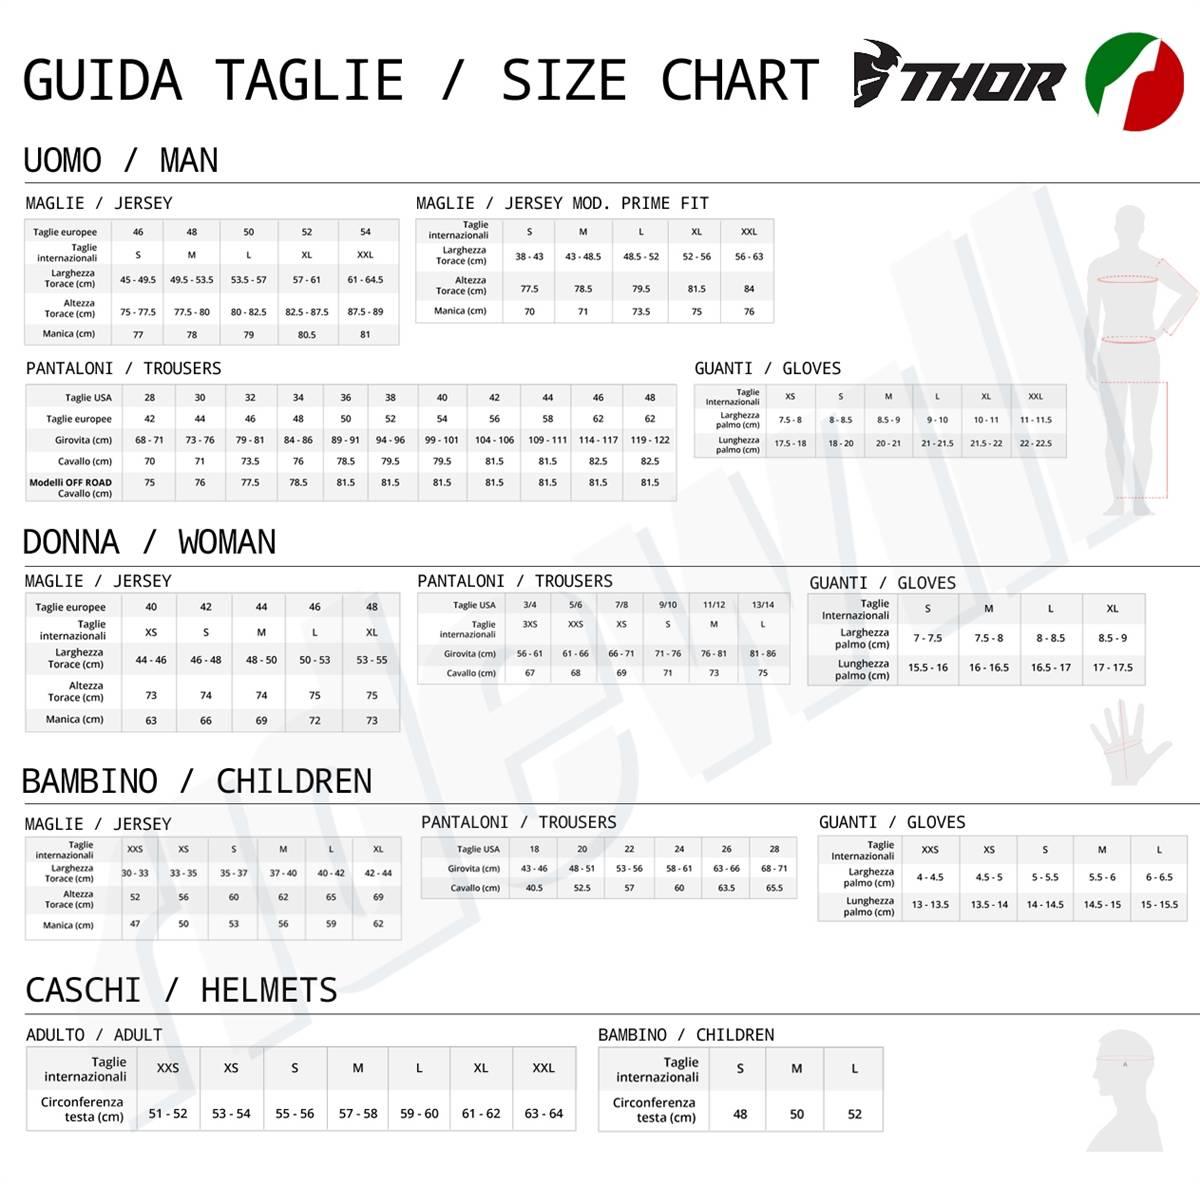 Size chart brand Thor